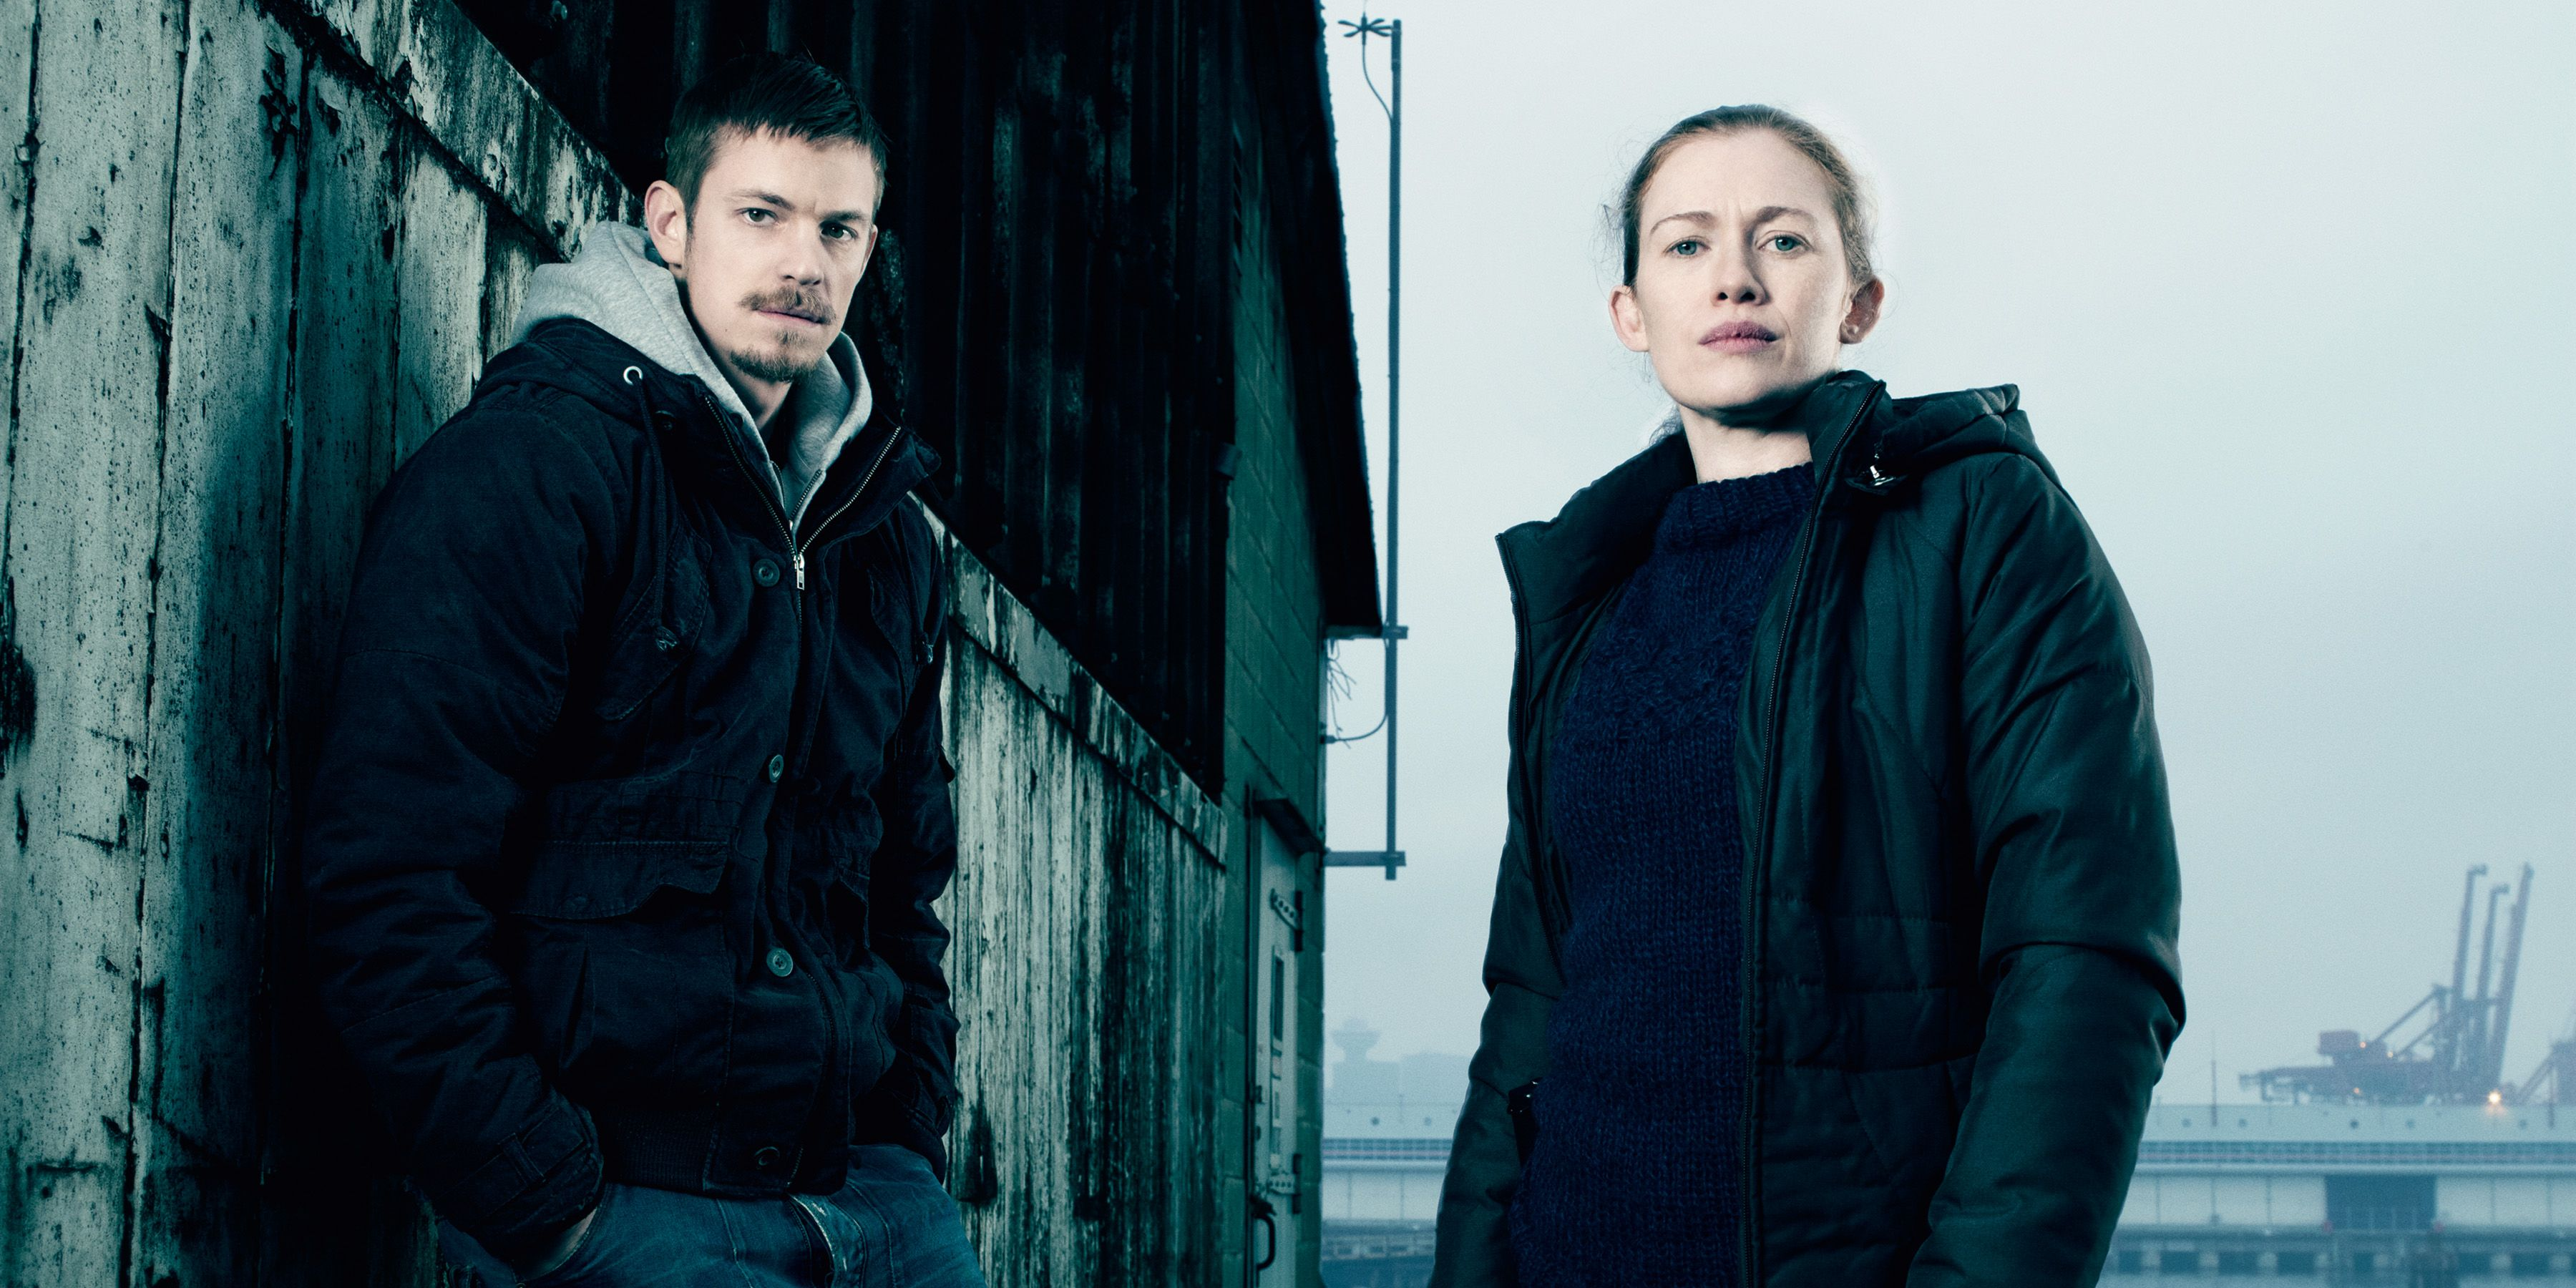 The Killing, Joel Kinnaman, Mireille Enos